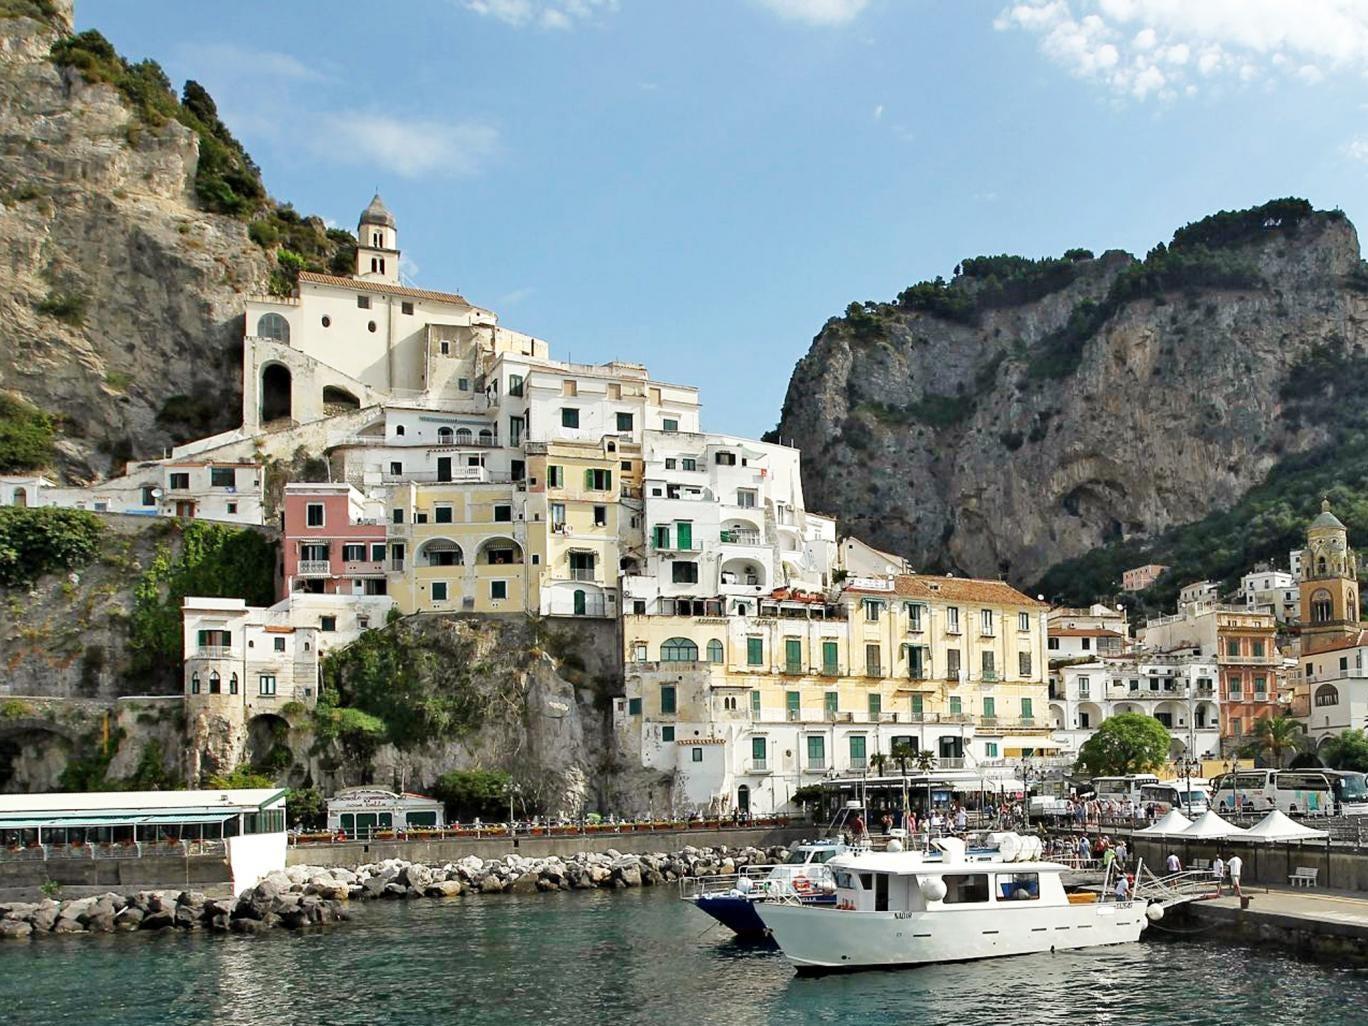 That's amore: the seductive Amalfi coast